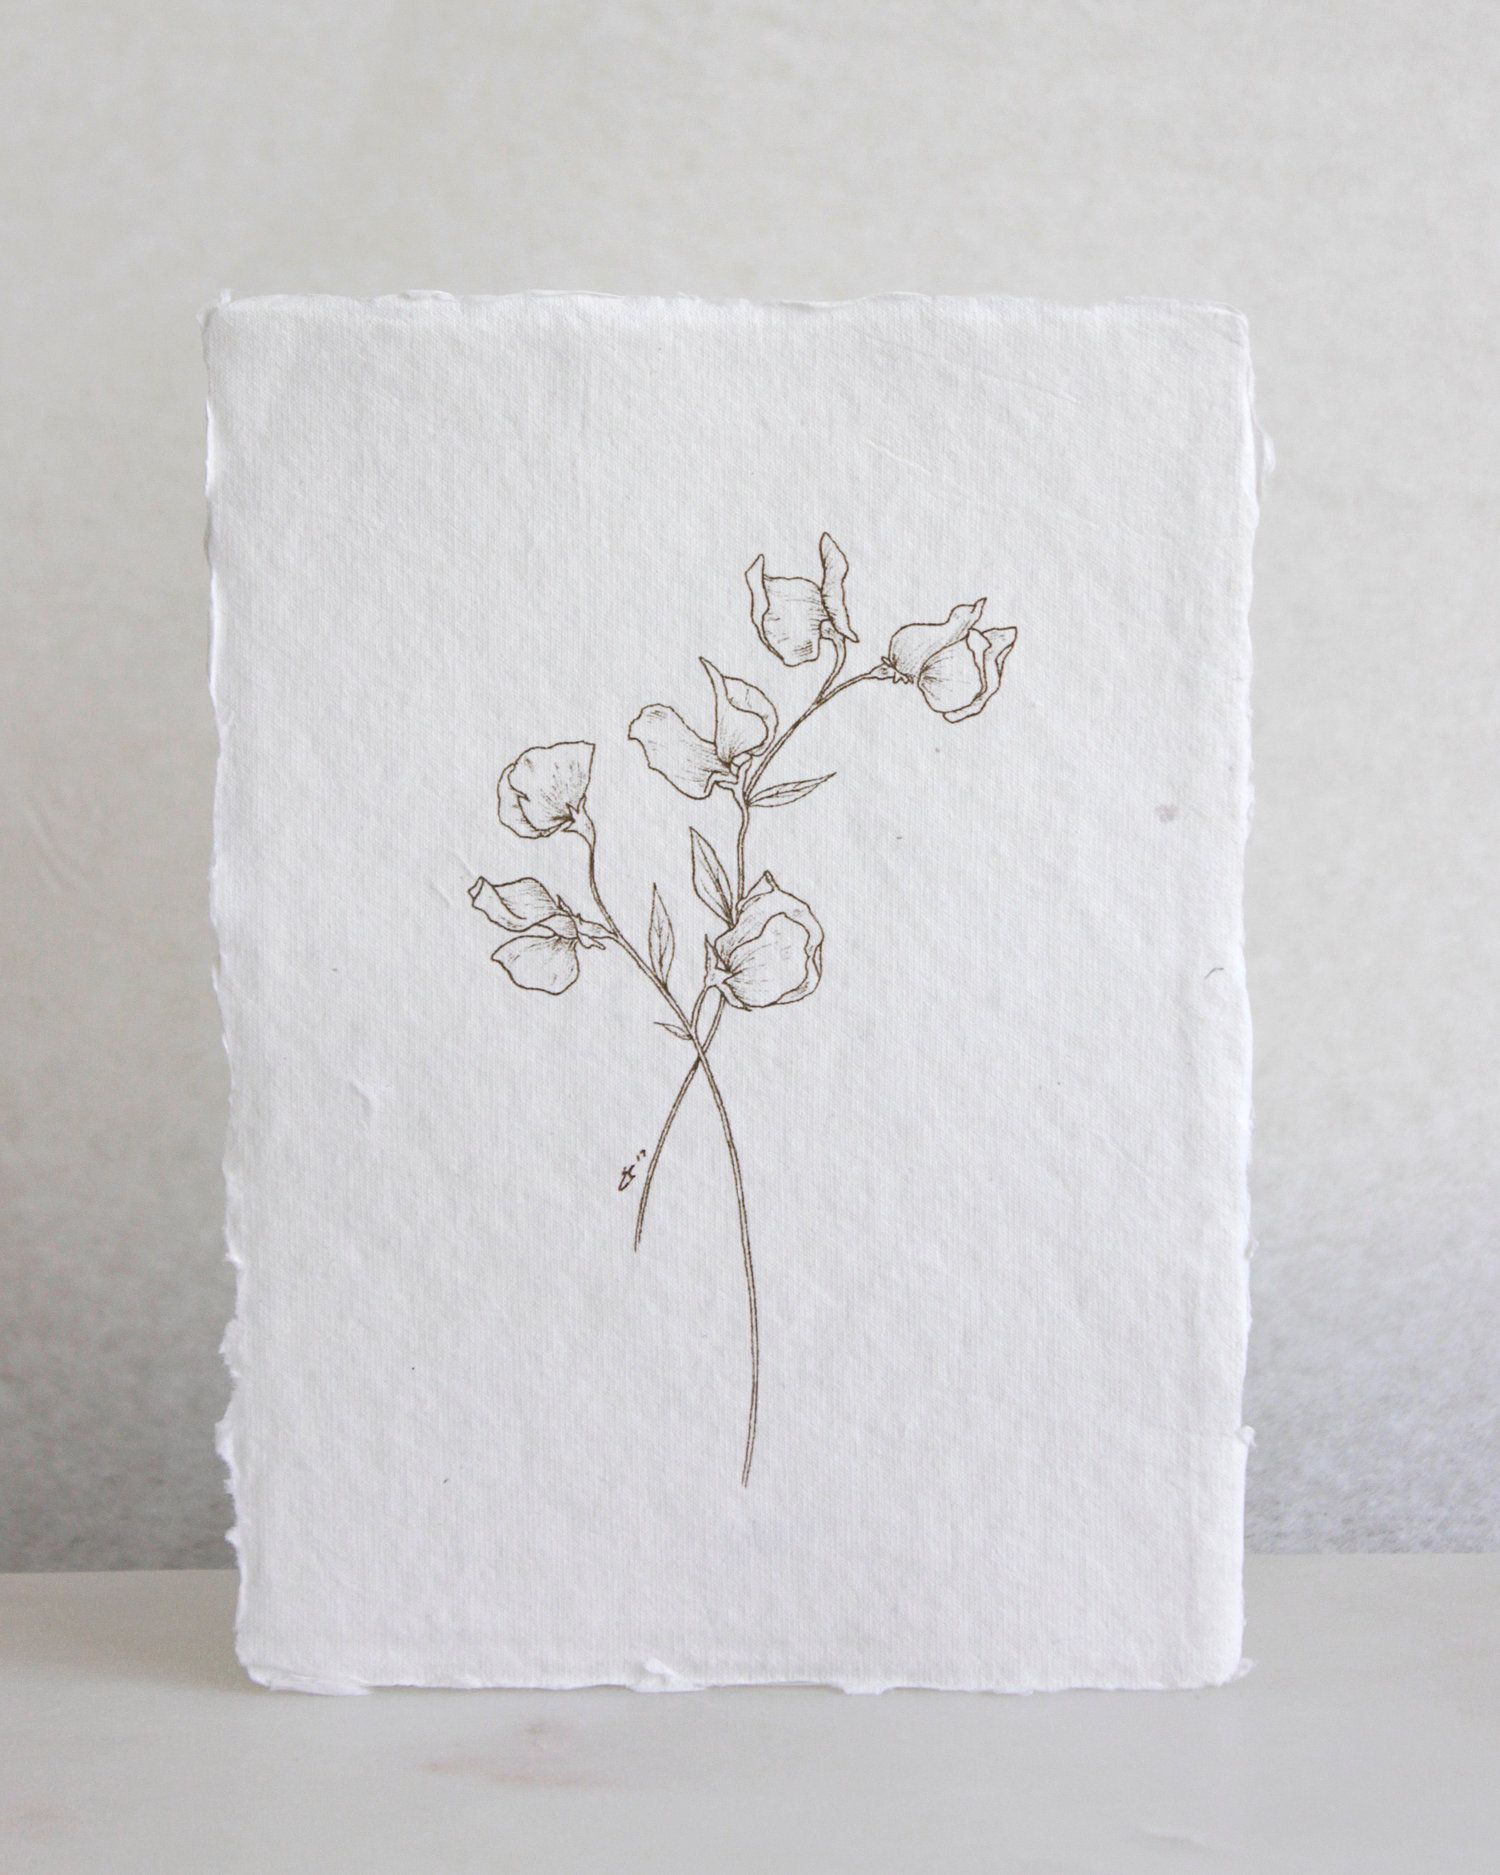 Small Acid Tattoo: Blog — Esther Clark Illustration & Calligraphy